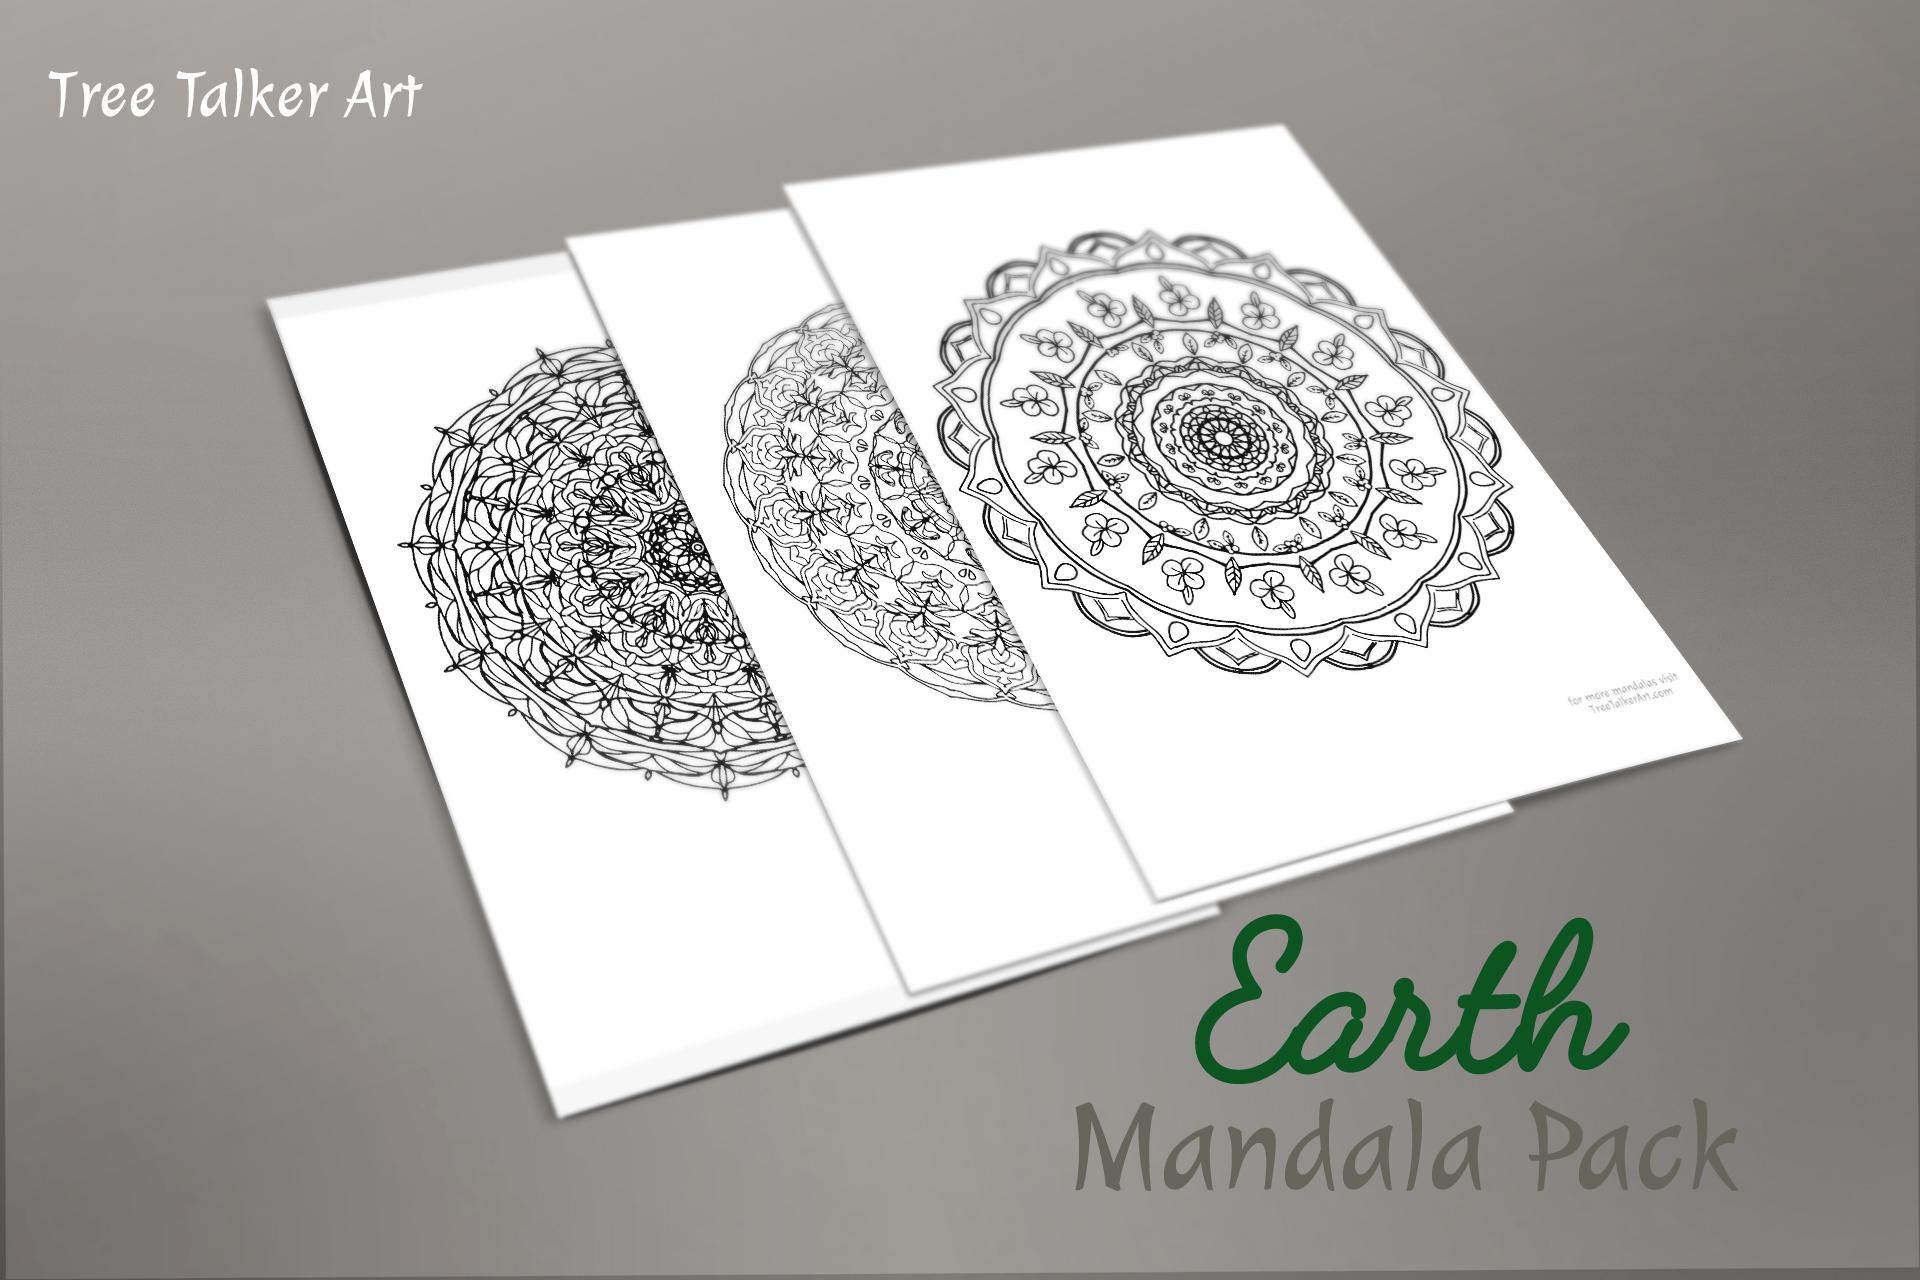 Earth Downloadable Mandala Meditation Pack | Tree Talker Art